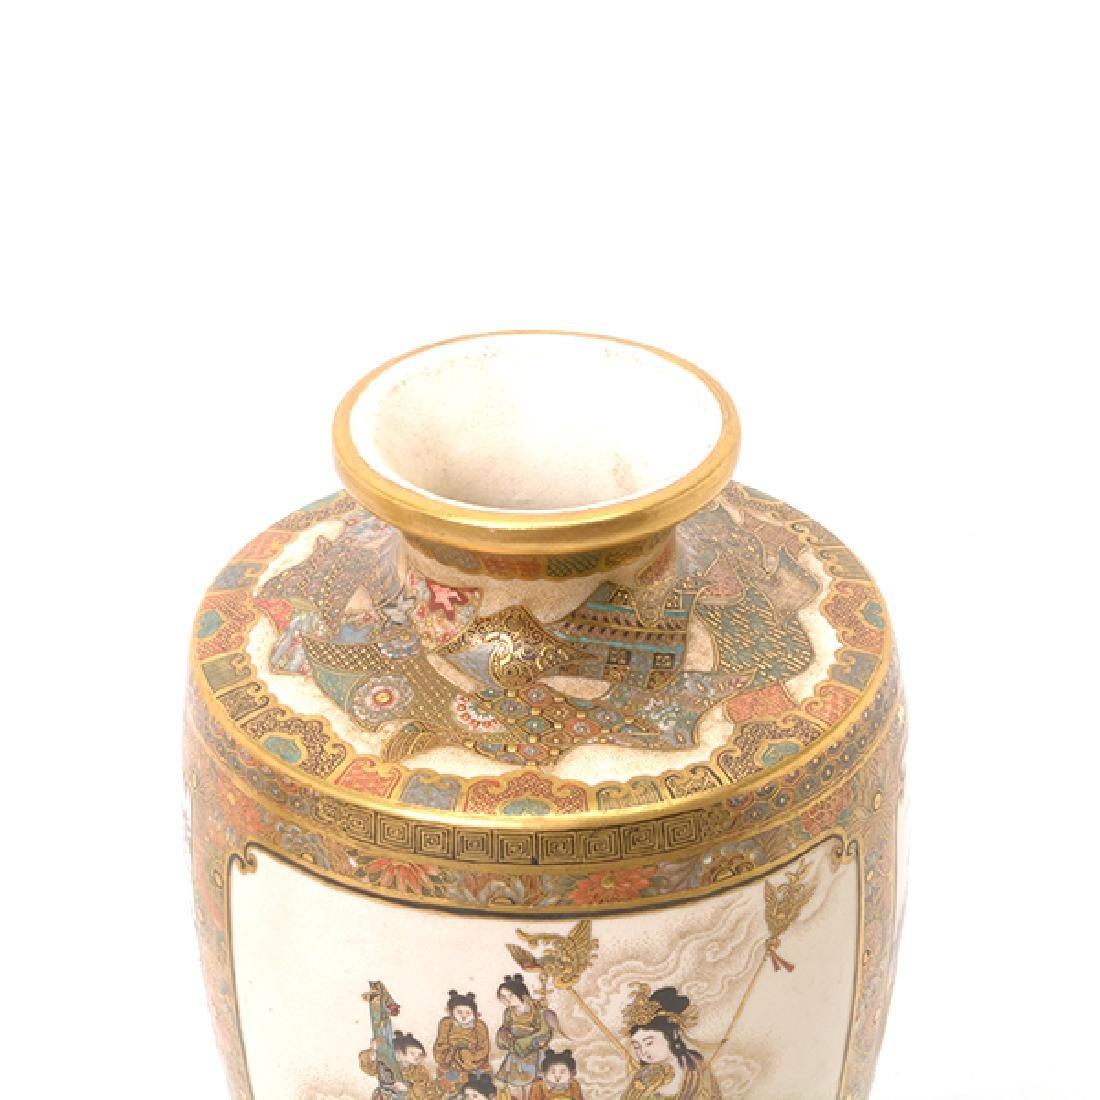 A Pair of Satsuma Vases By Okamoto Ryozan, Meiji Period - 2